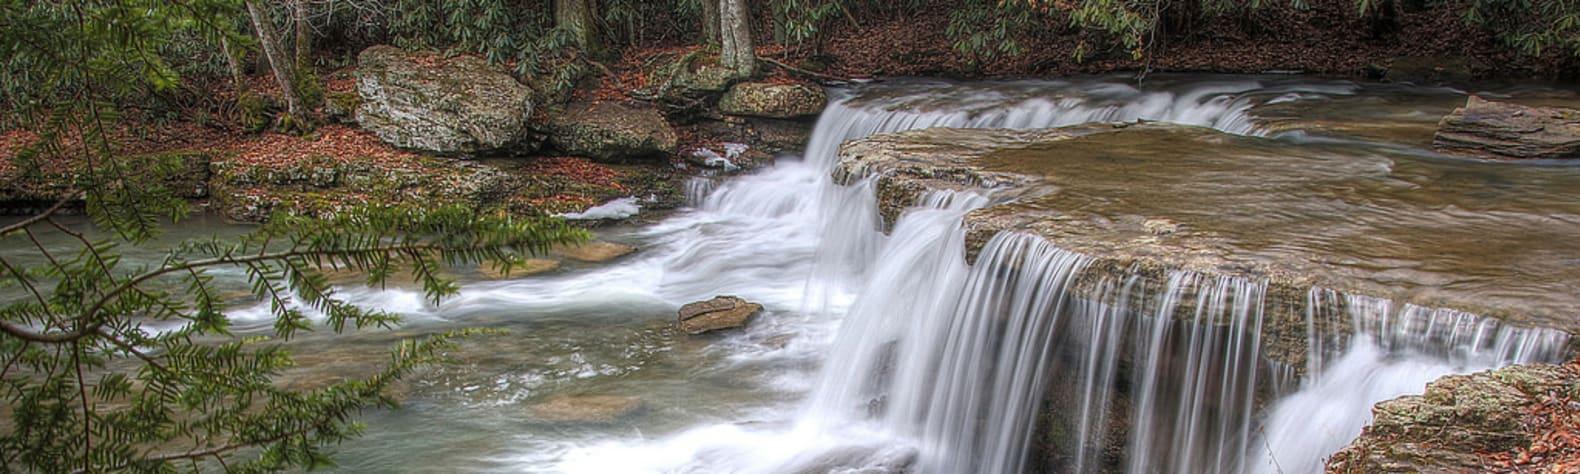 Cabwaylingo State Forest